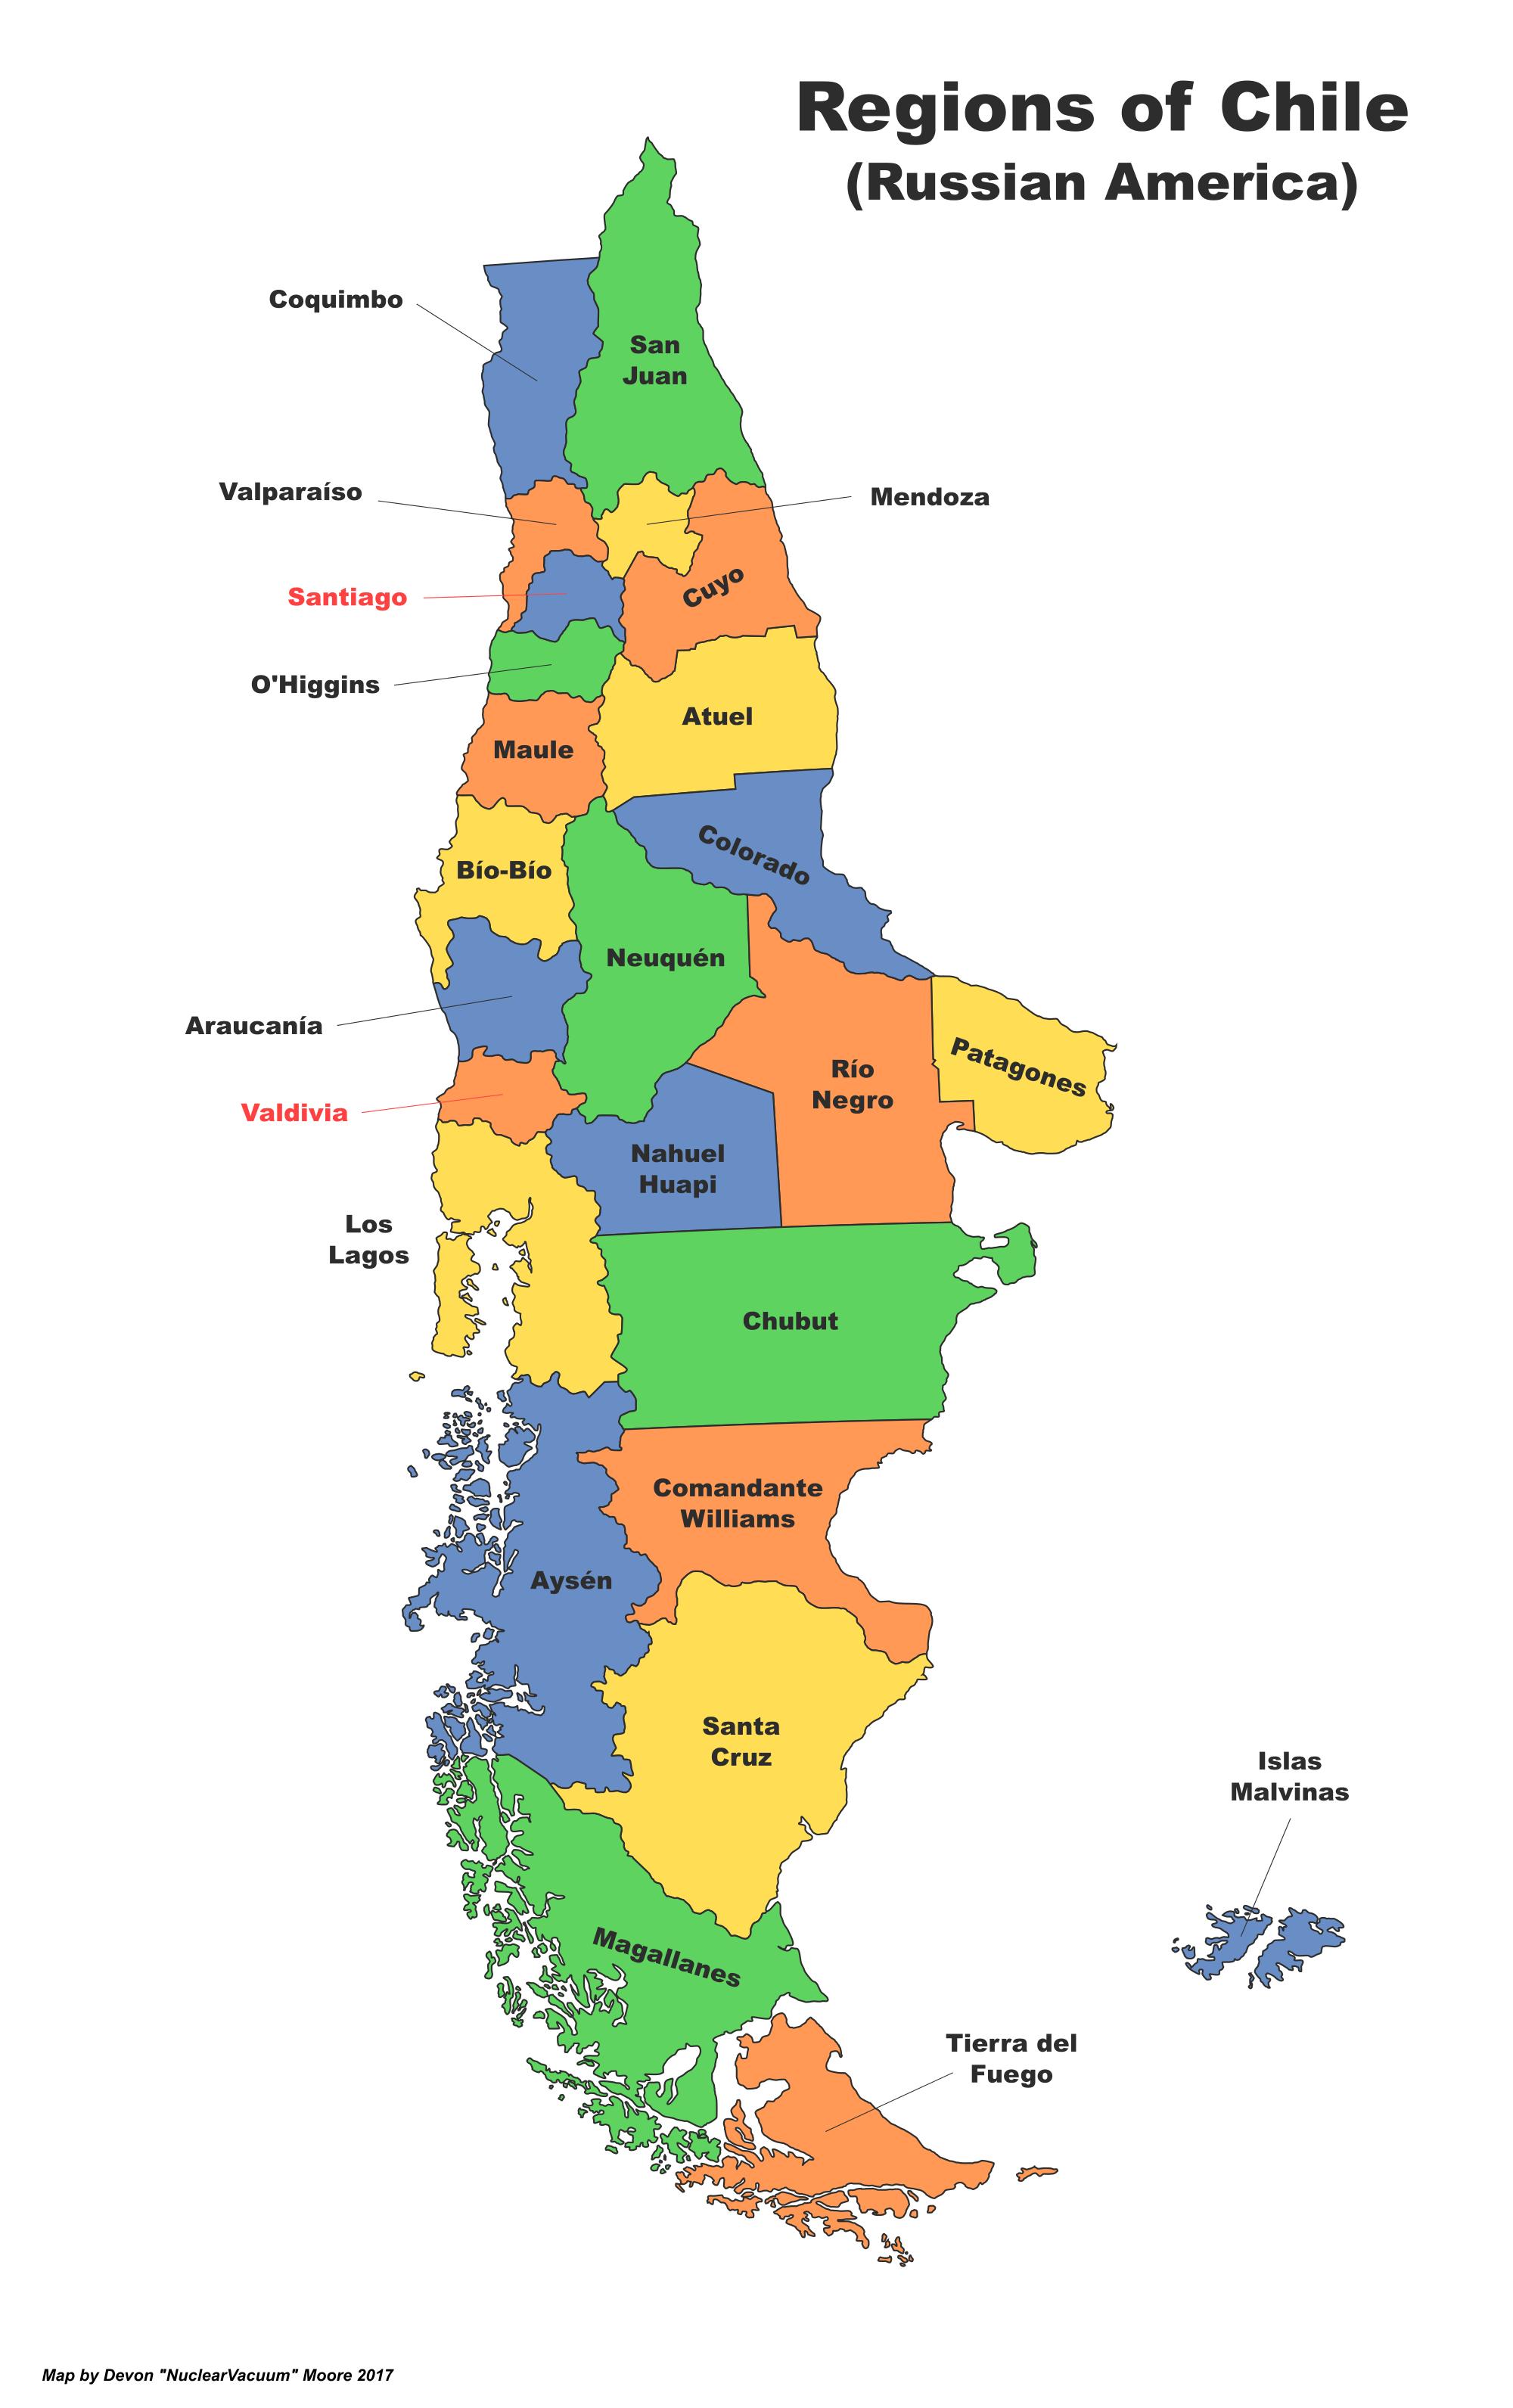 Chile (Russian America) | Alternative History | FANDOM ... on bolivia map, guatemala map, europe map, peru map, panama map, angola map, eritrea map, central america map, quebec map, columbia map, benin map, colombia map, aruba map, cuba map, spain map, pacific ocean map, punta arenas map, ecuador map, algeria map, south america map, united states map, france map, australia map, egypt map, tierra del fuego map, croatia map, china map, brazil map, cameroon map, japan map, canada map, latin america map, belgium map, argentina map, libya map,